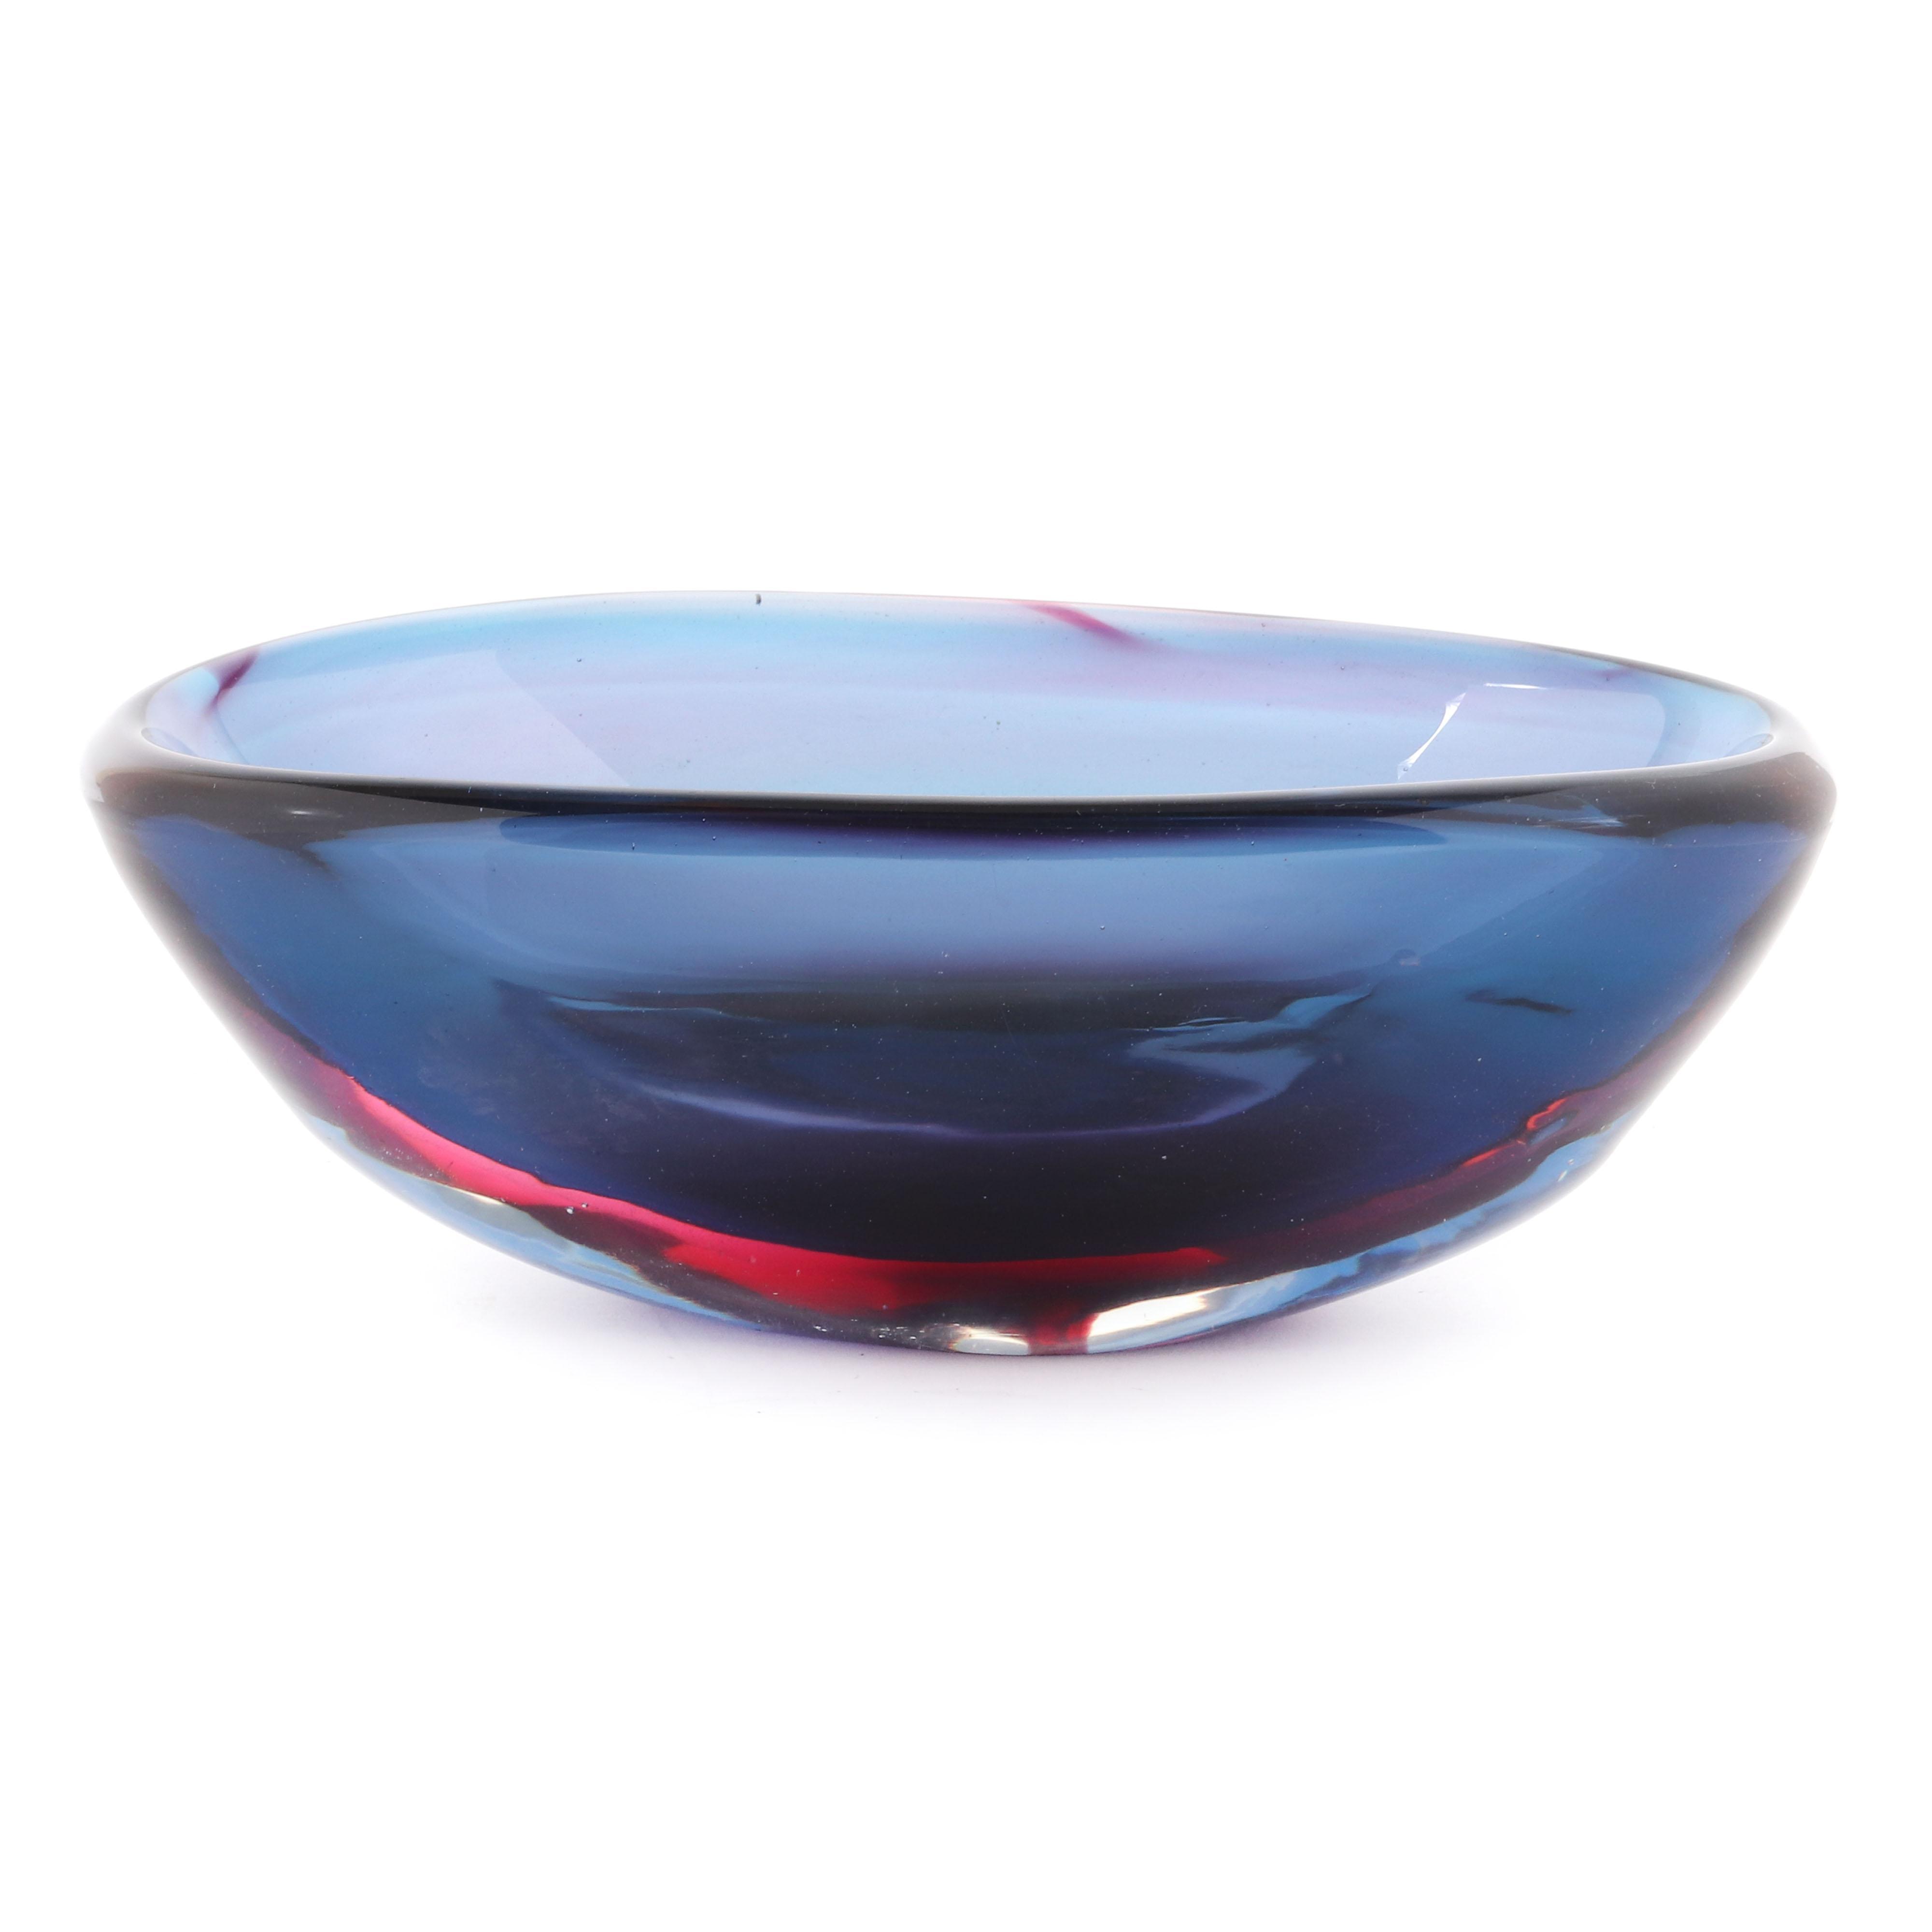 "Flavio Poli Seguso Vetri d'Arte Murano art glass Sommerso bowl. 5""H x 13"" diam"